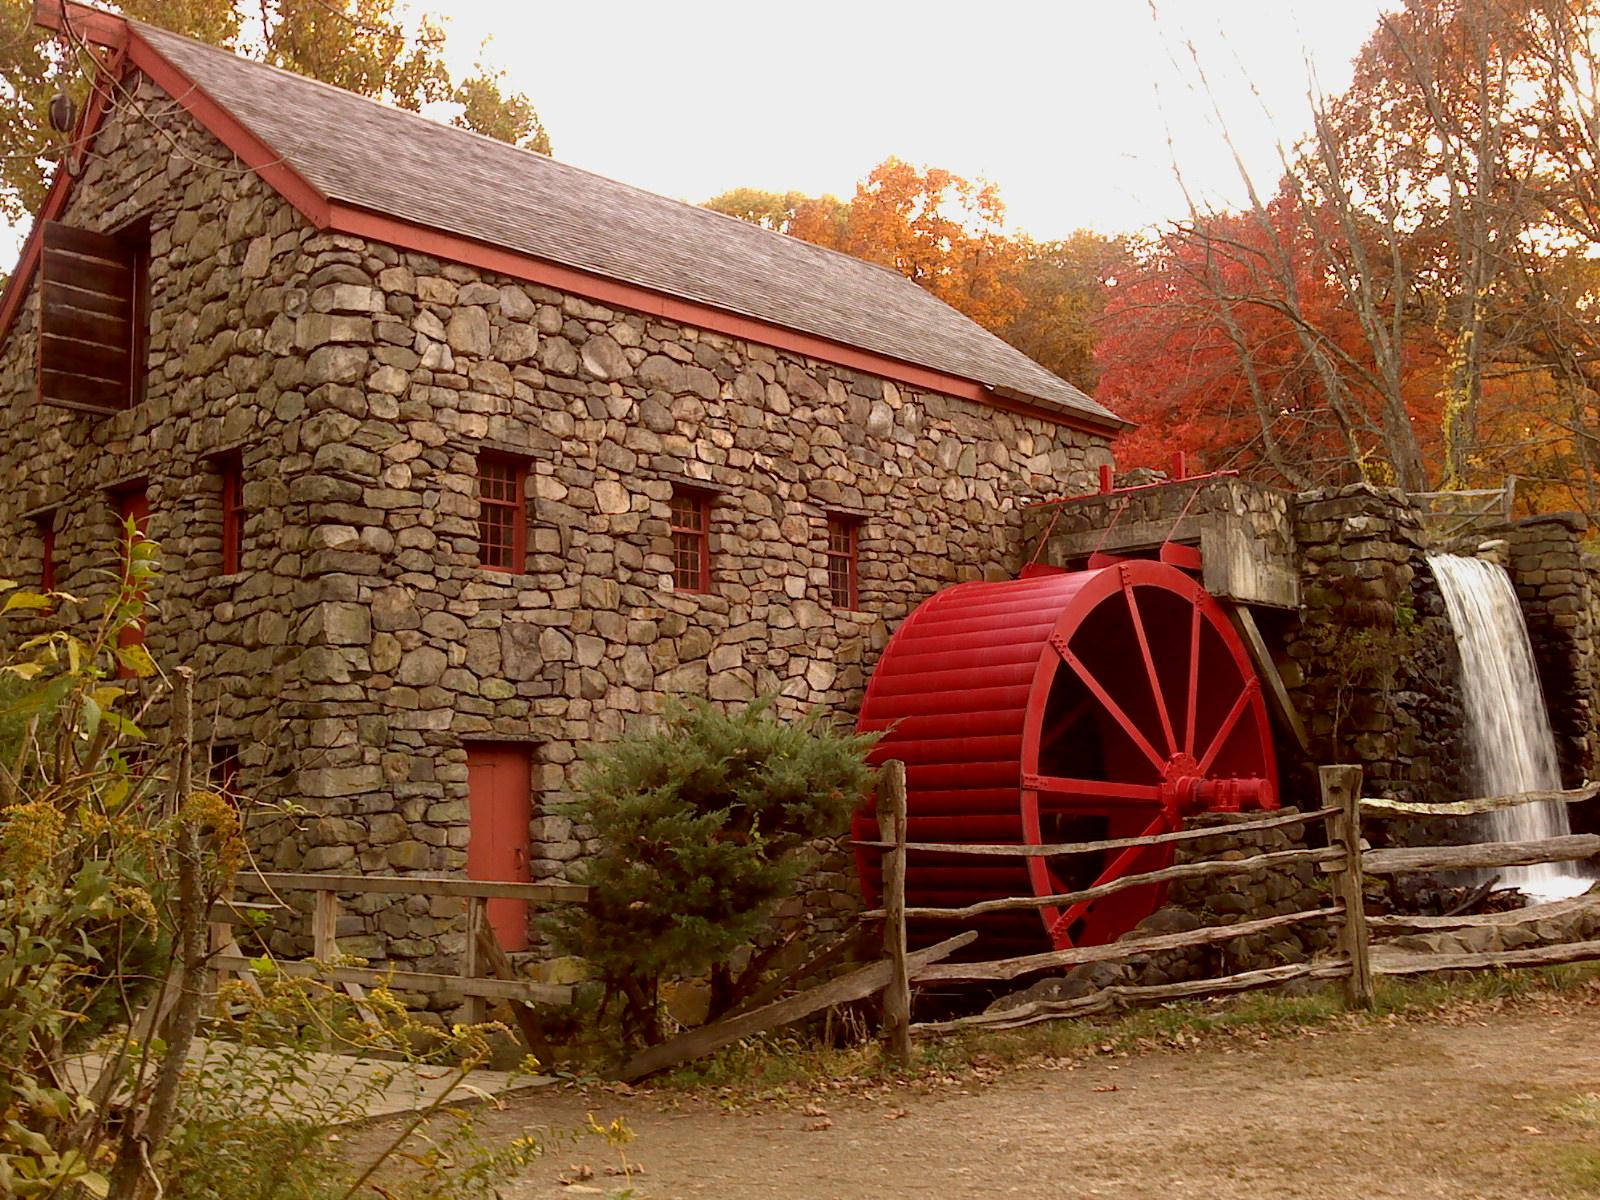 The Wayside Inn Grist Mill Photos New England Today